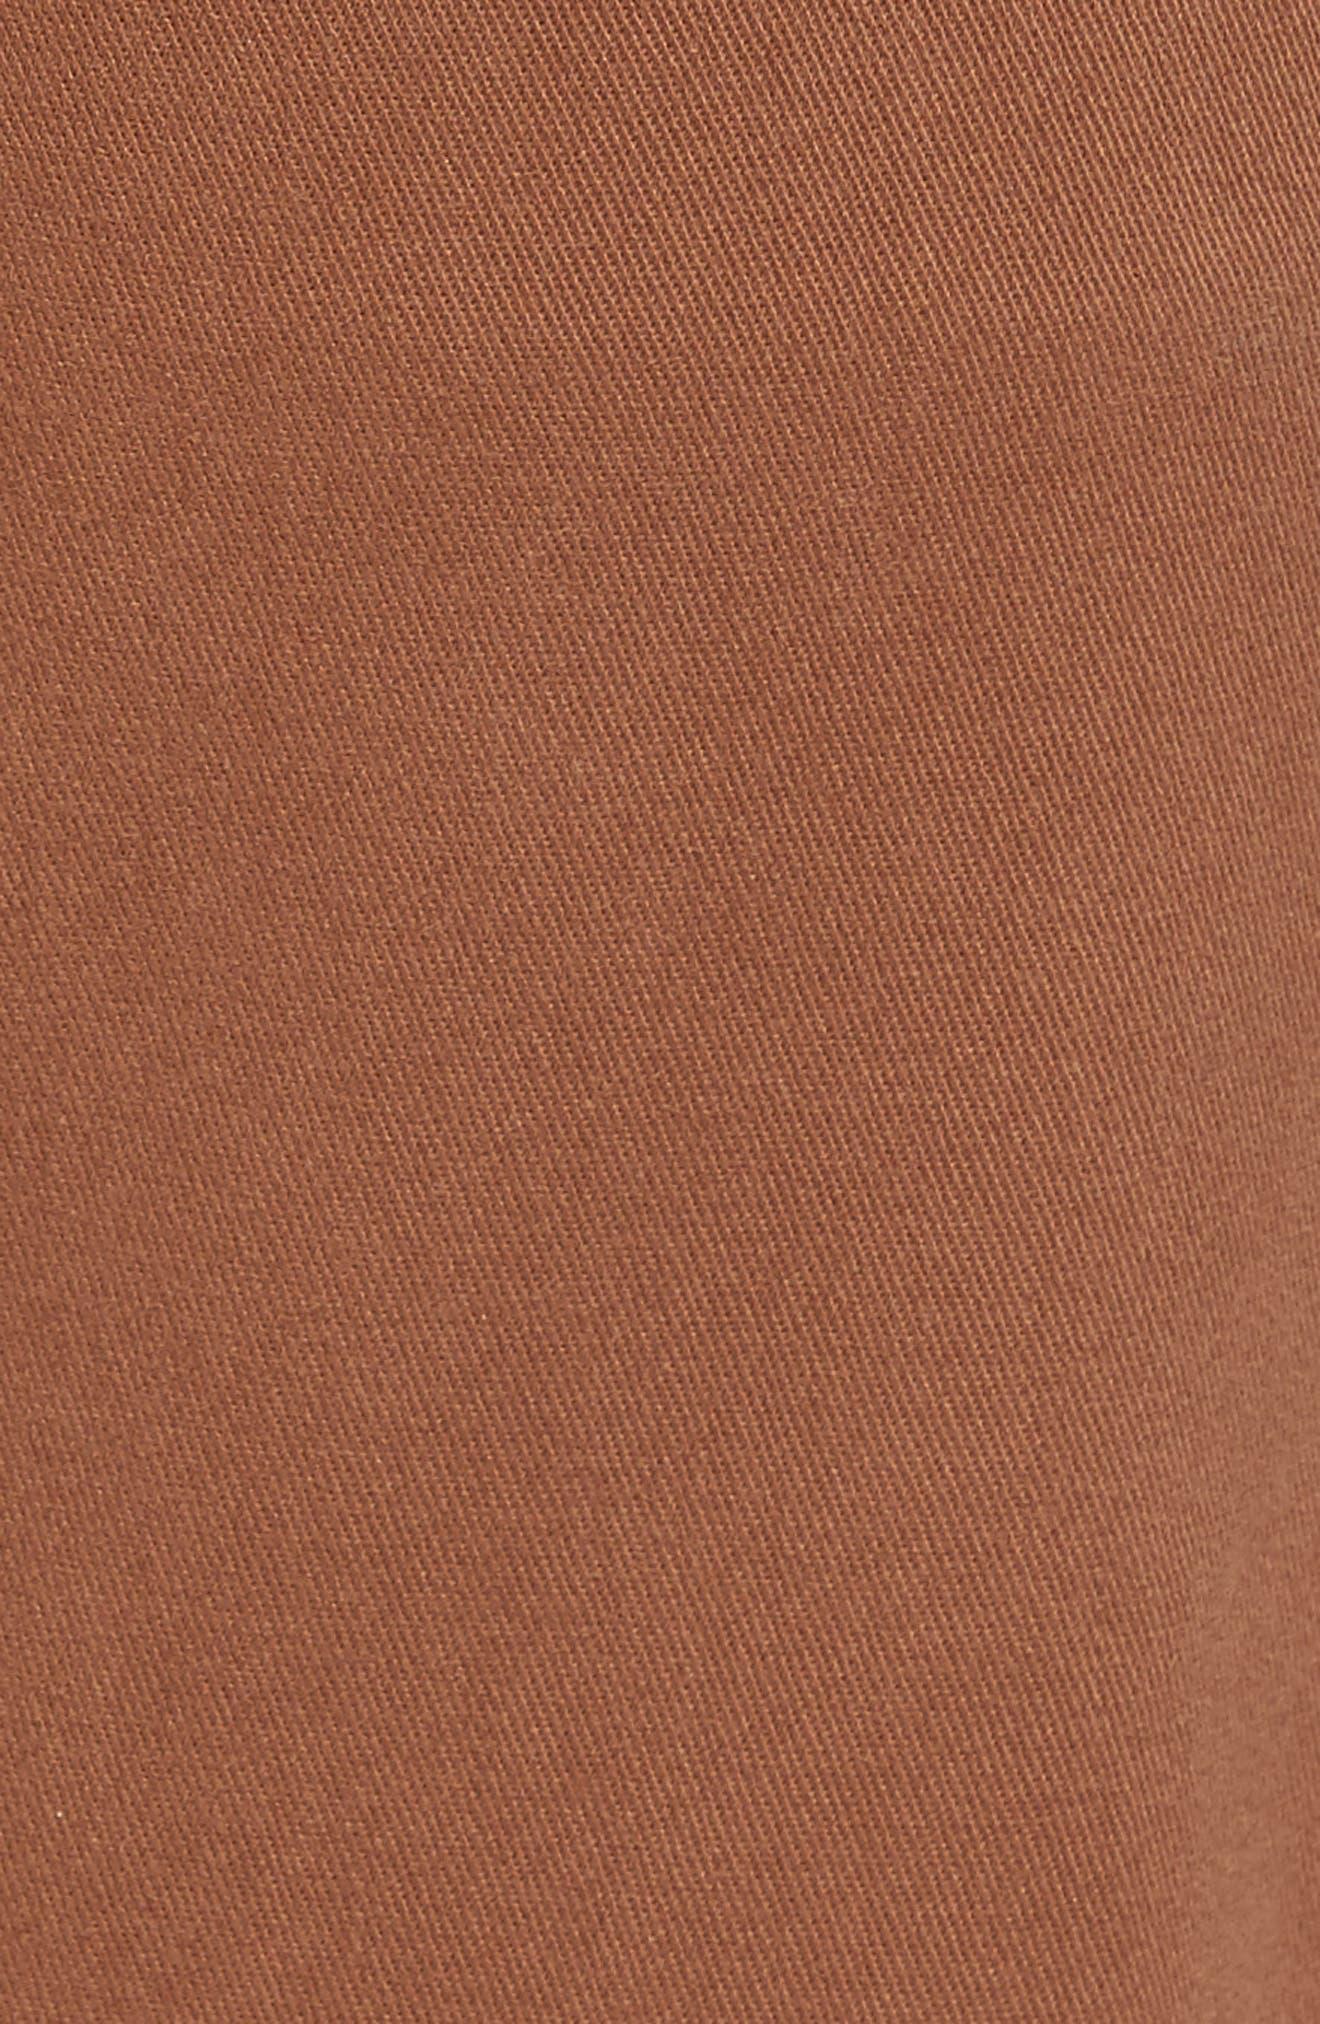 Blake Slim Fit Jeans,                             Alternate thumbnail 5, color,                             Masonite